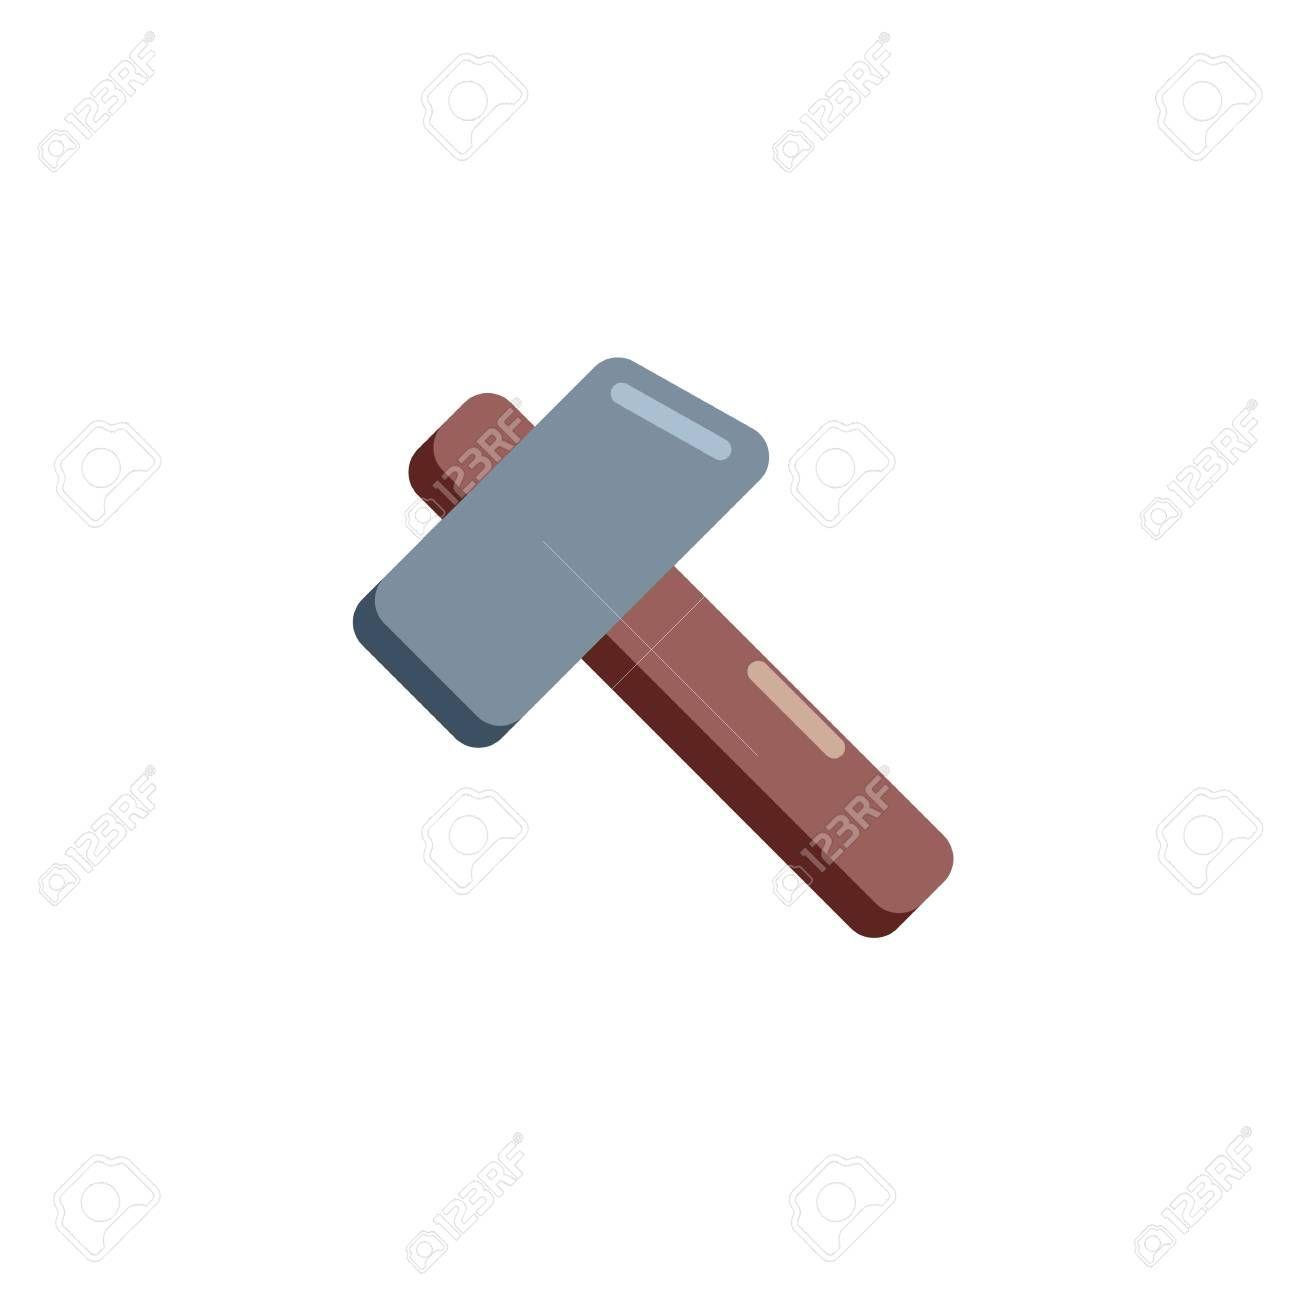 Gaming Hammer flat icon, vector sign, colorful pictogram isolated on white. Magic hammer symbol, logo illustration. Flat style design , #SPONSORED, #colorful, #sign, #isolated, #pictogram, #vector